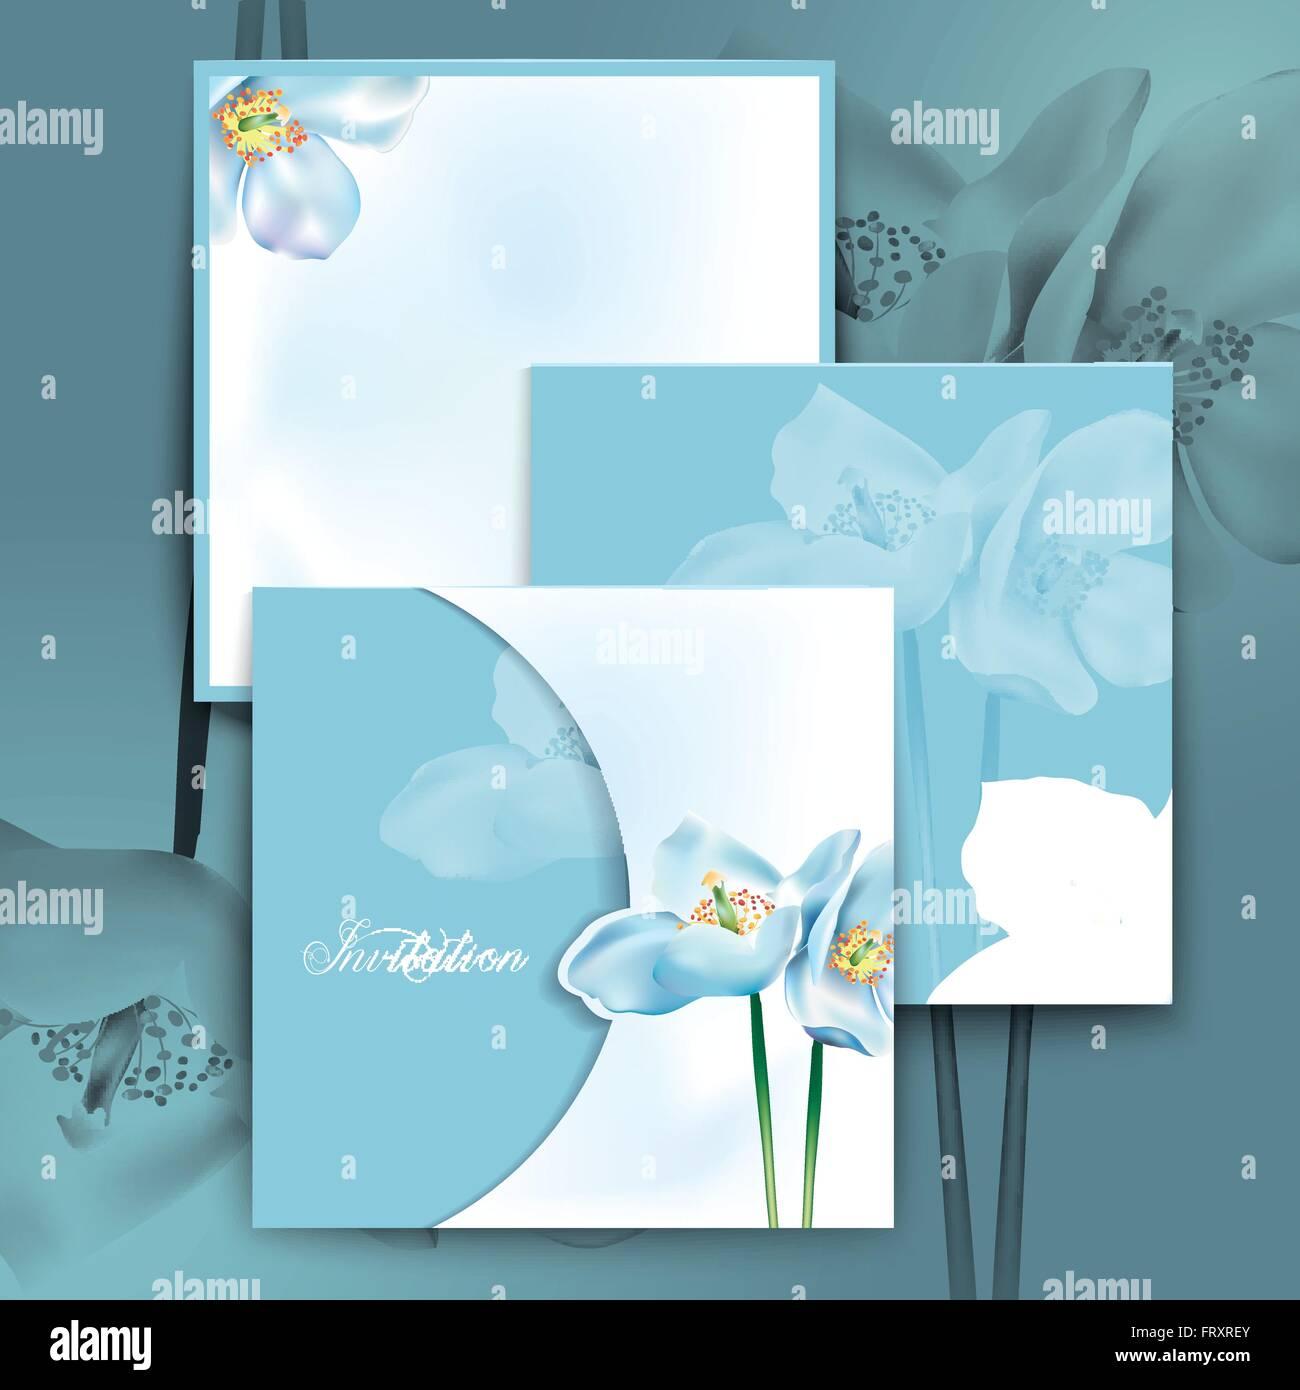 Romantic Watercolor Flowers Invitation Template Design In Blue Stock